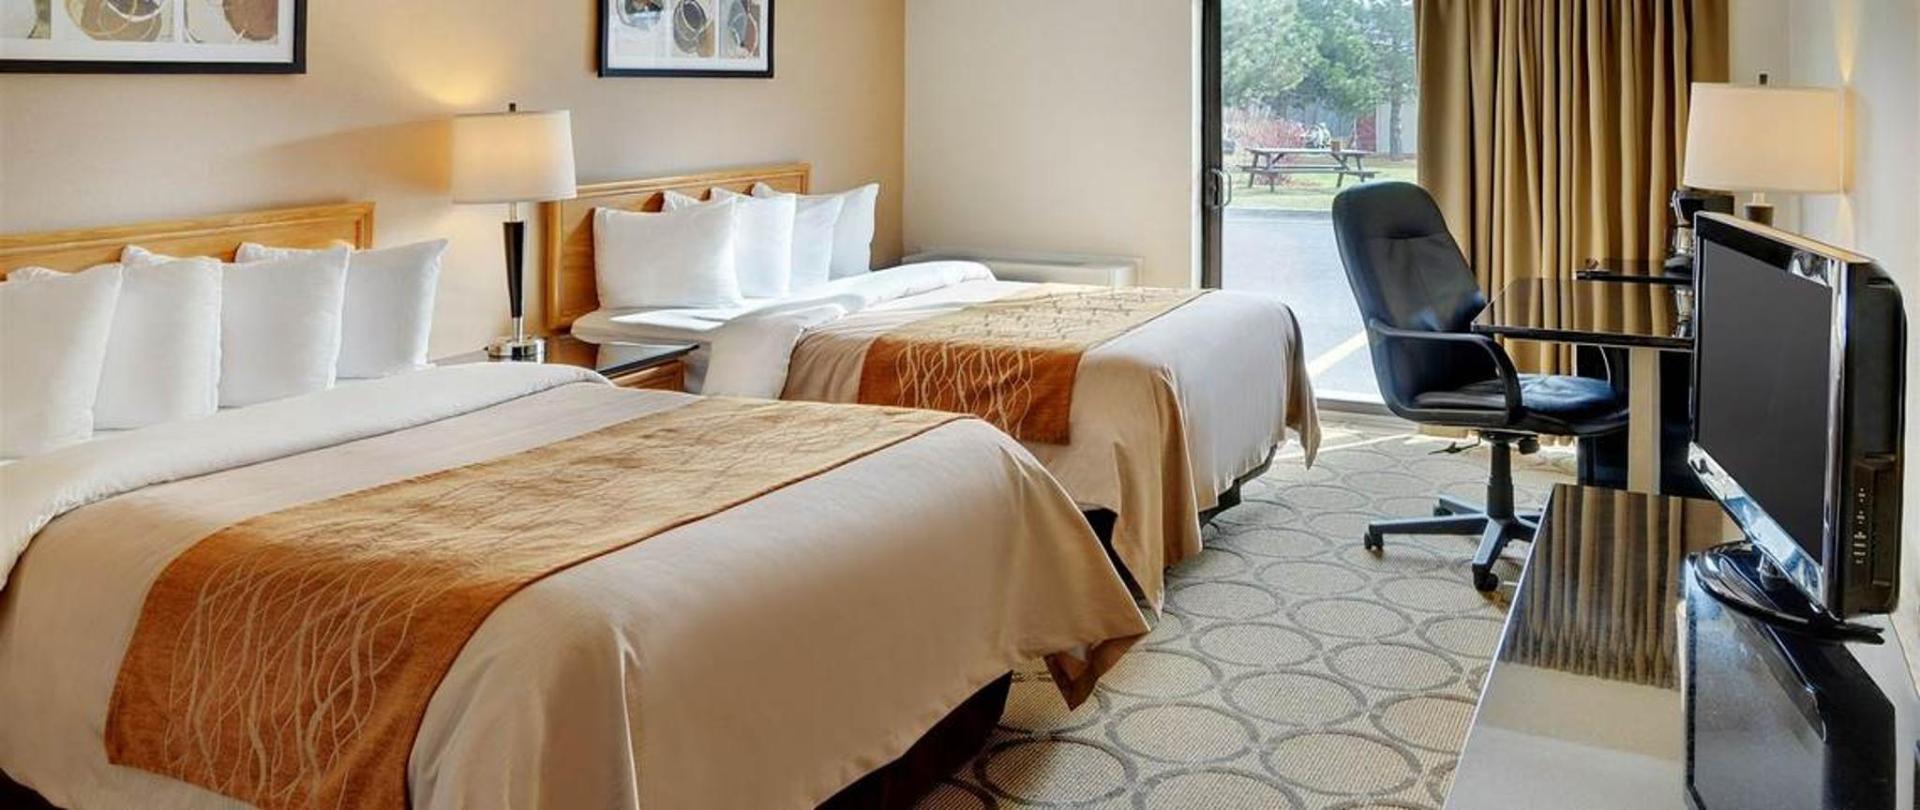 guestroom-with-two-pillowtop-beds-drive-up-patio-door-access1.jpg.1140x481_default.jpg